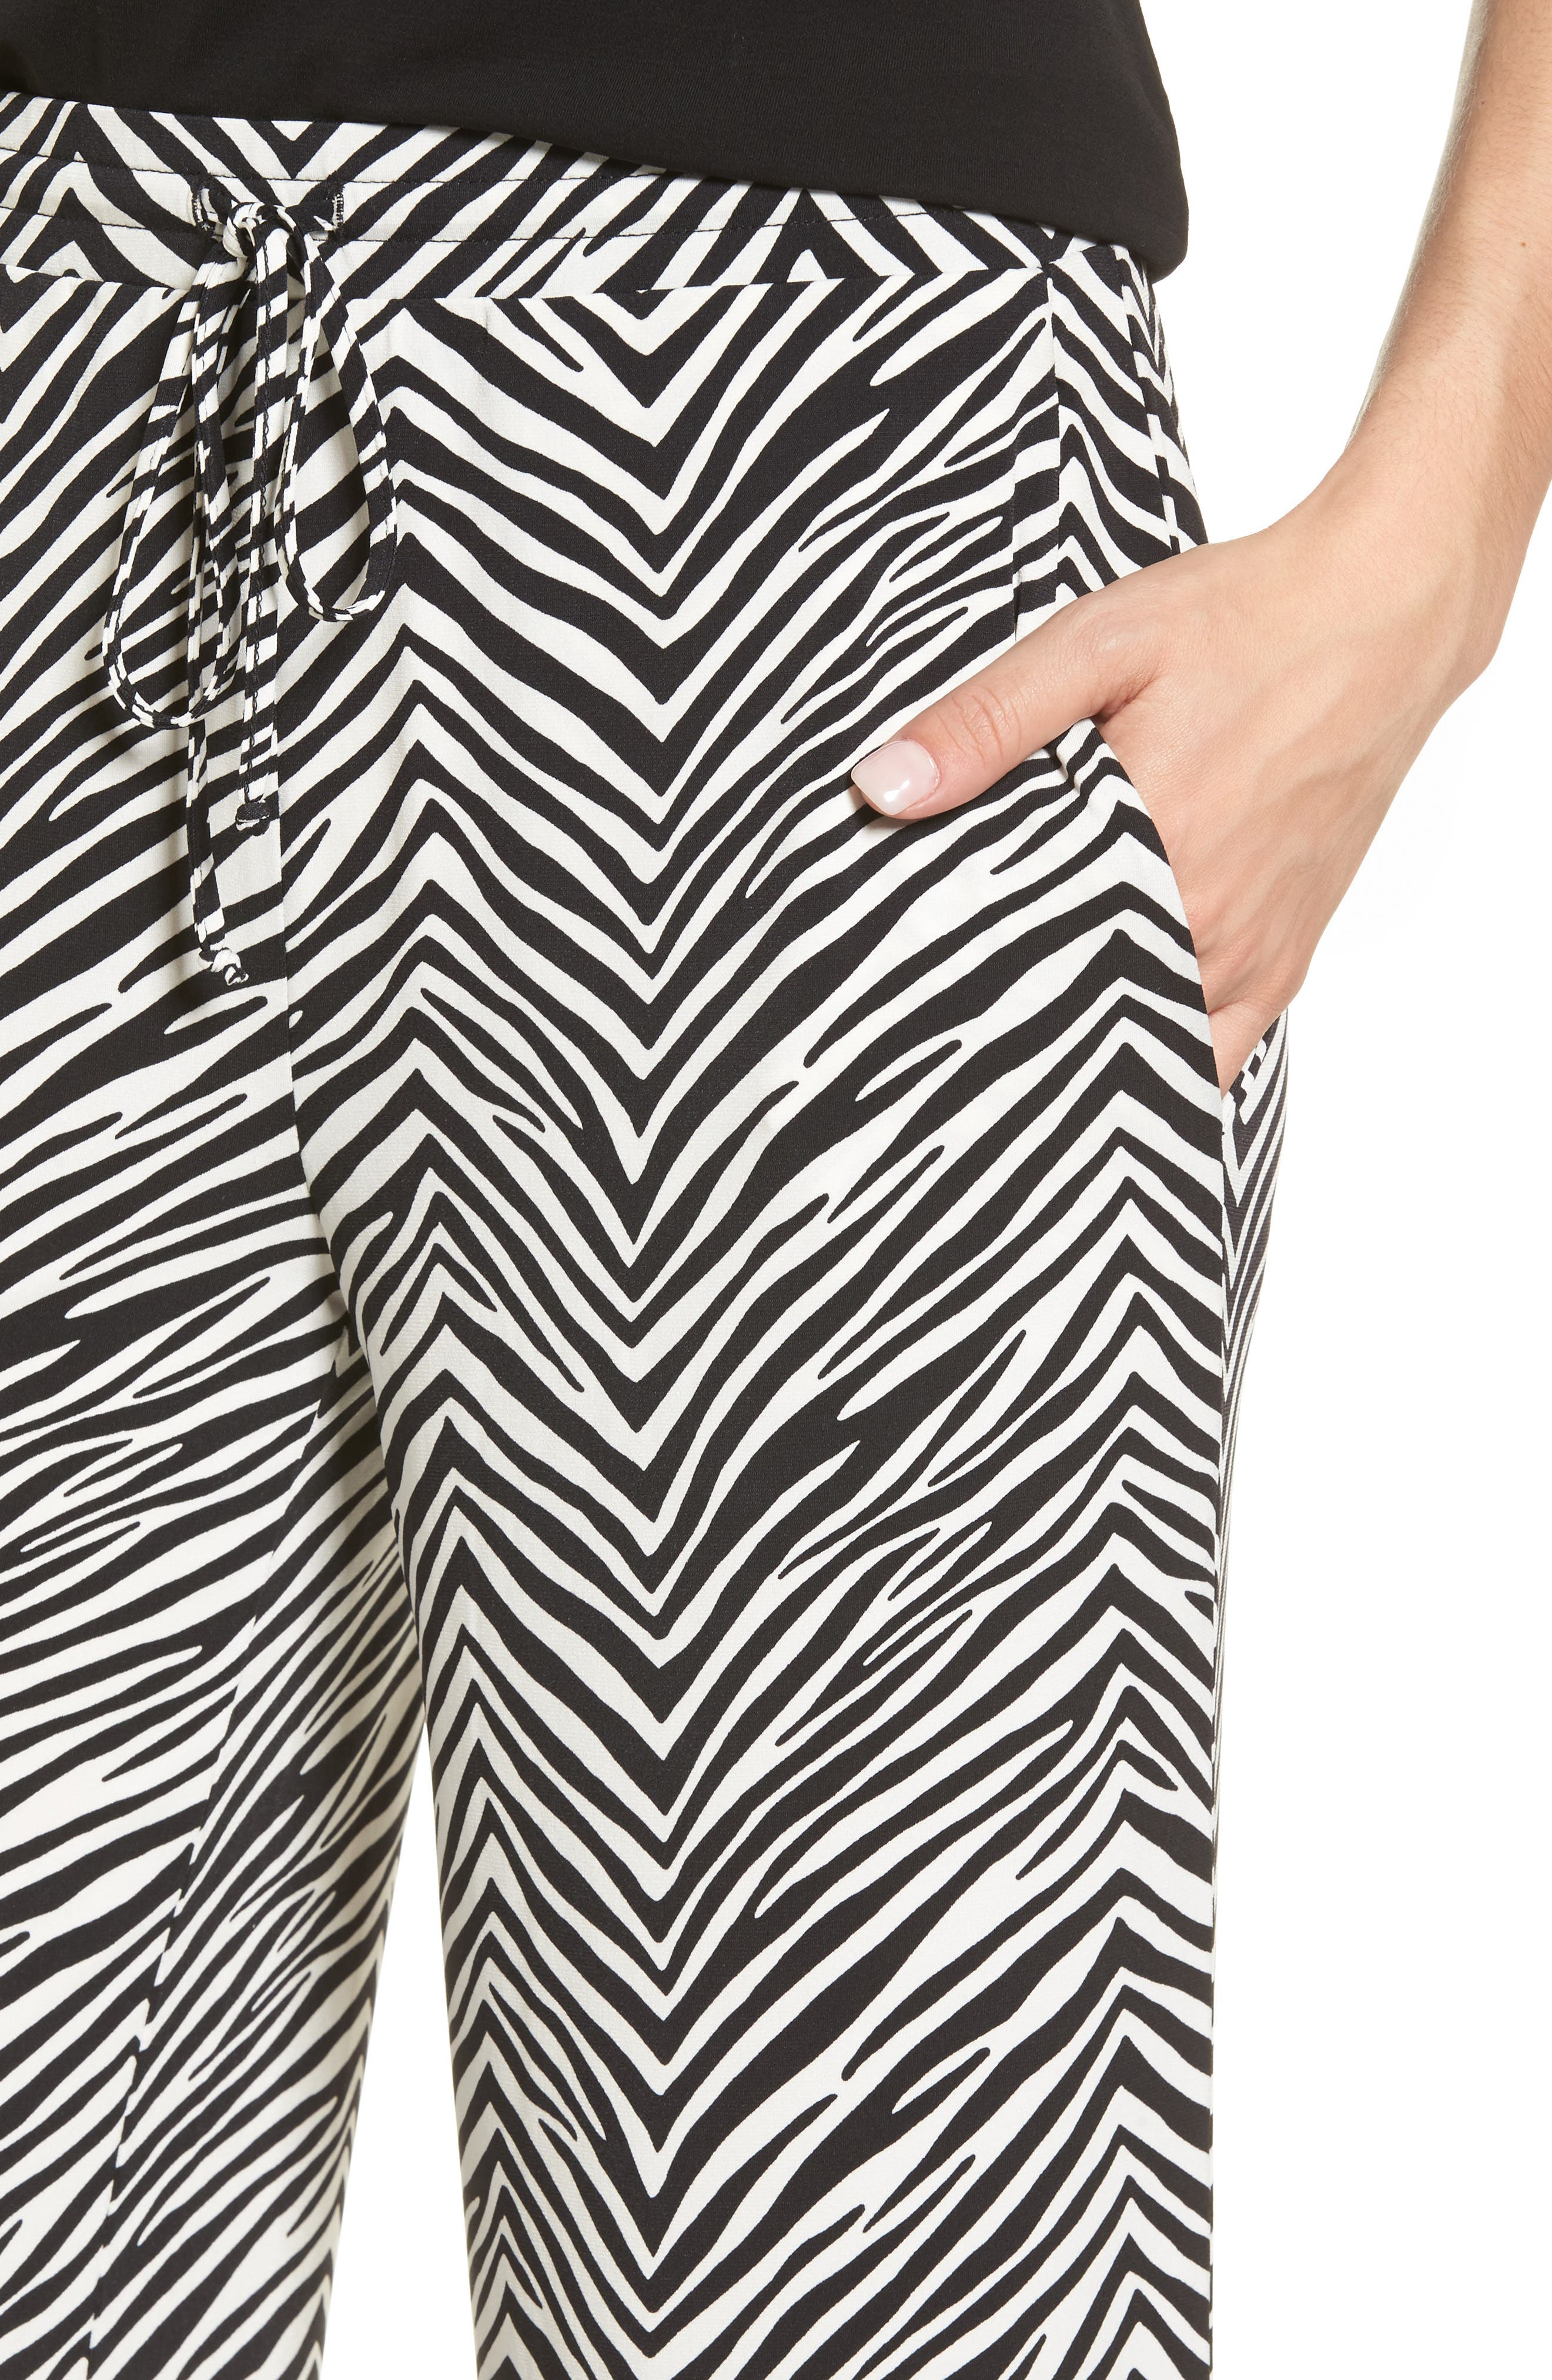 Zebra Print Drawstring Waist Pants,                             Alternate thumbnail 4, color,                             010